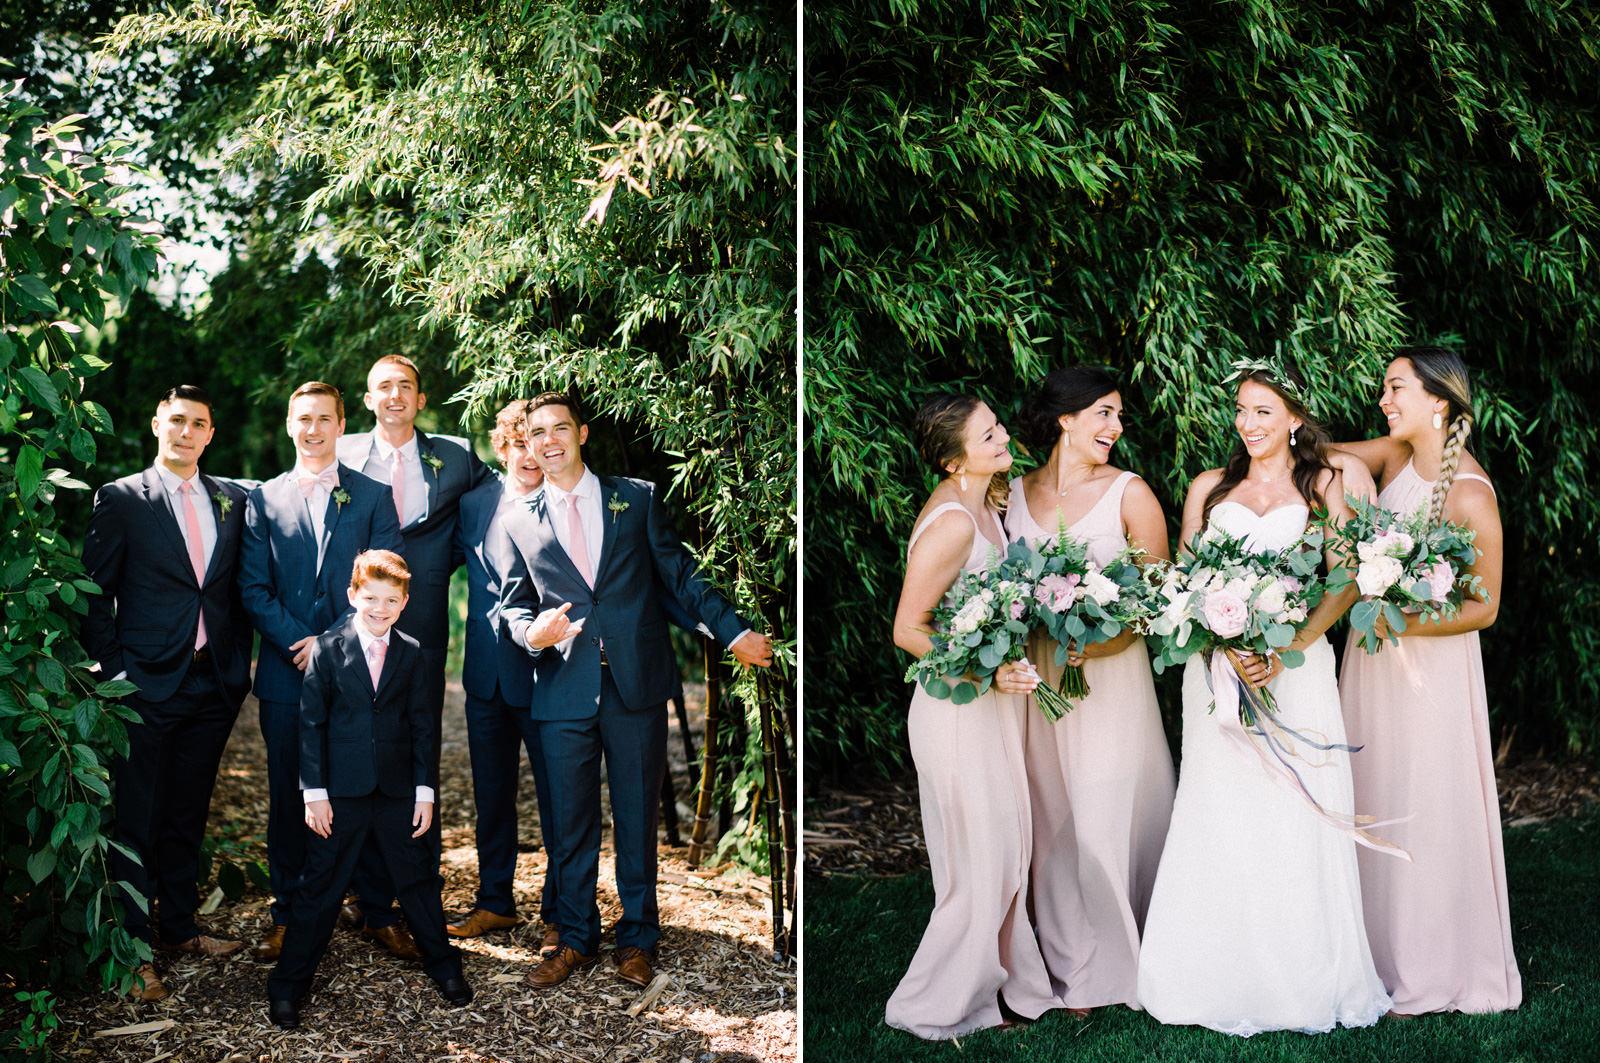 blog de fotografía de boda ryan flynn